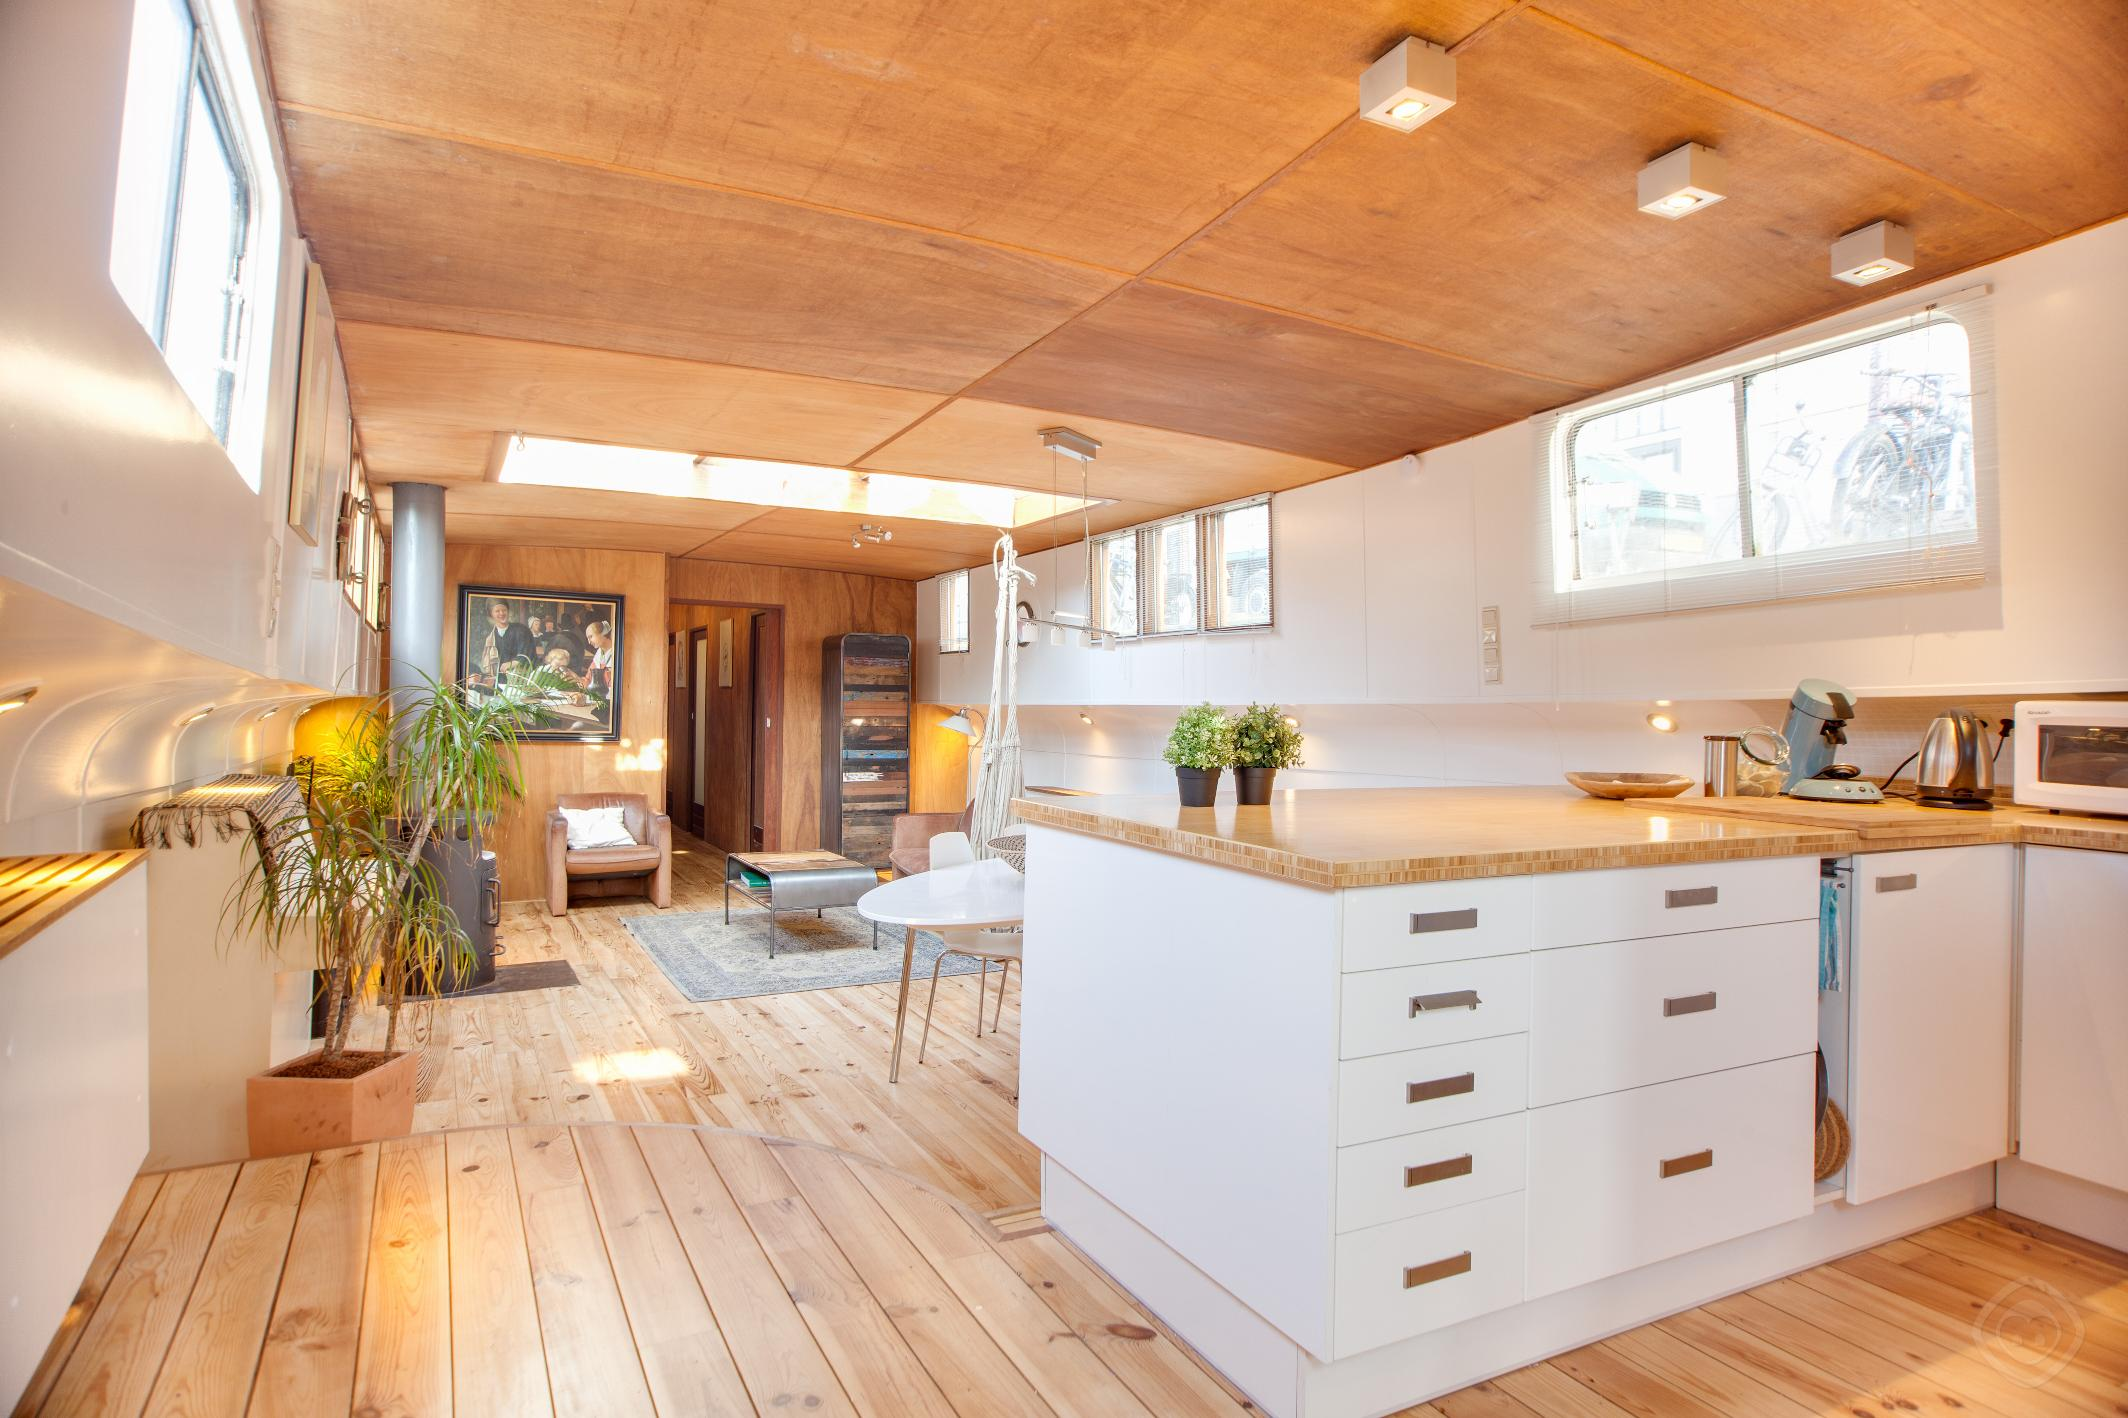 Montelbaan houseboat Amsterdam photo 31814463